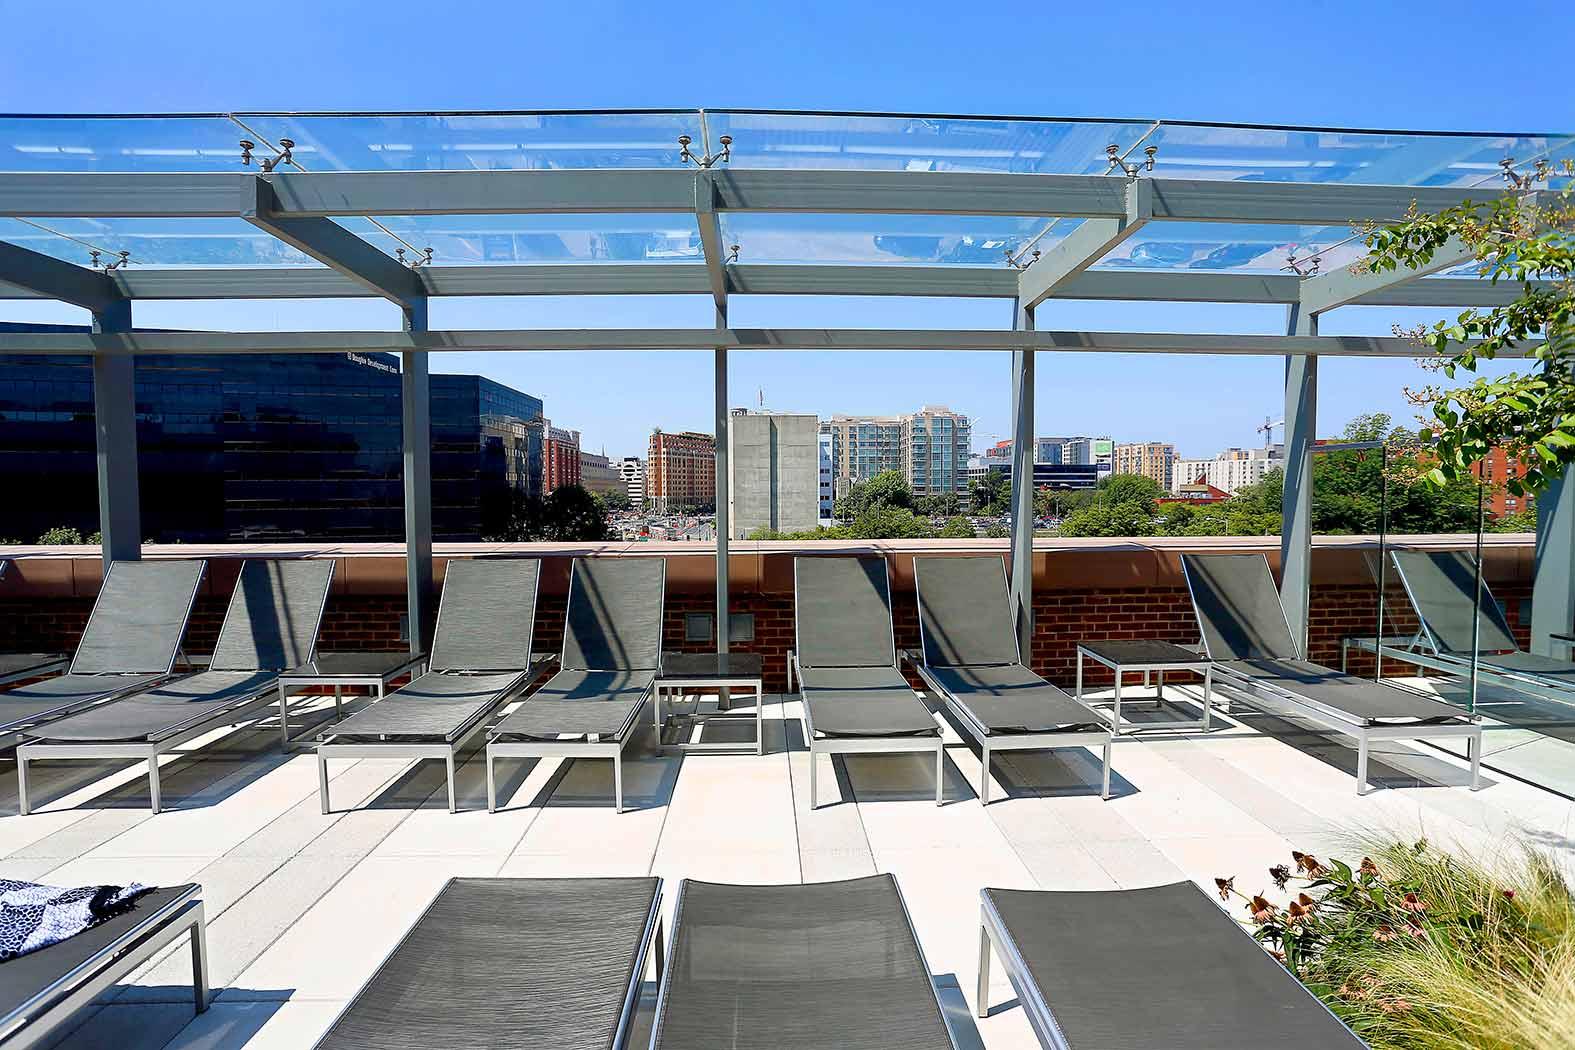 77 H Street Glass Canopy